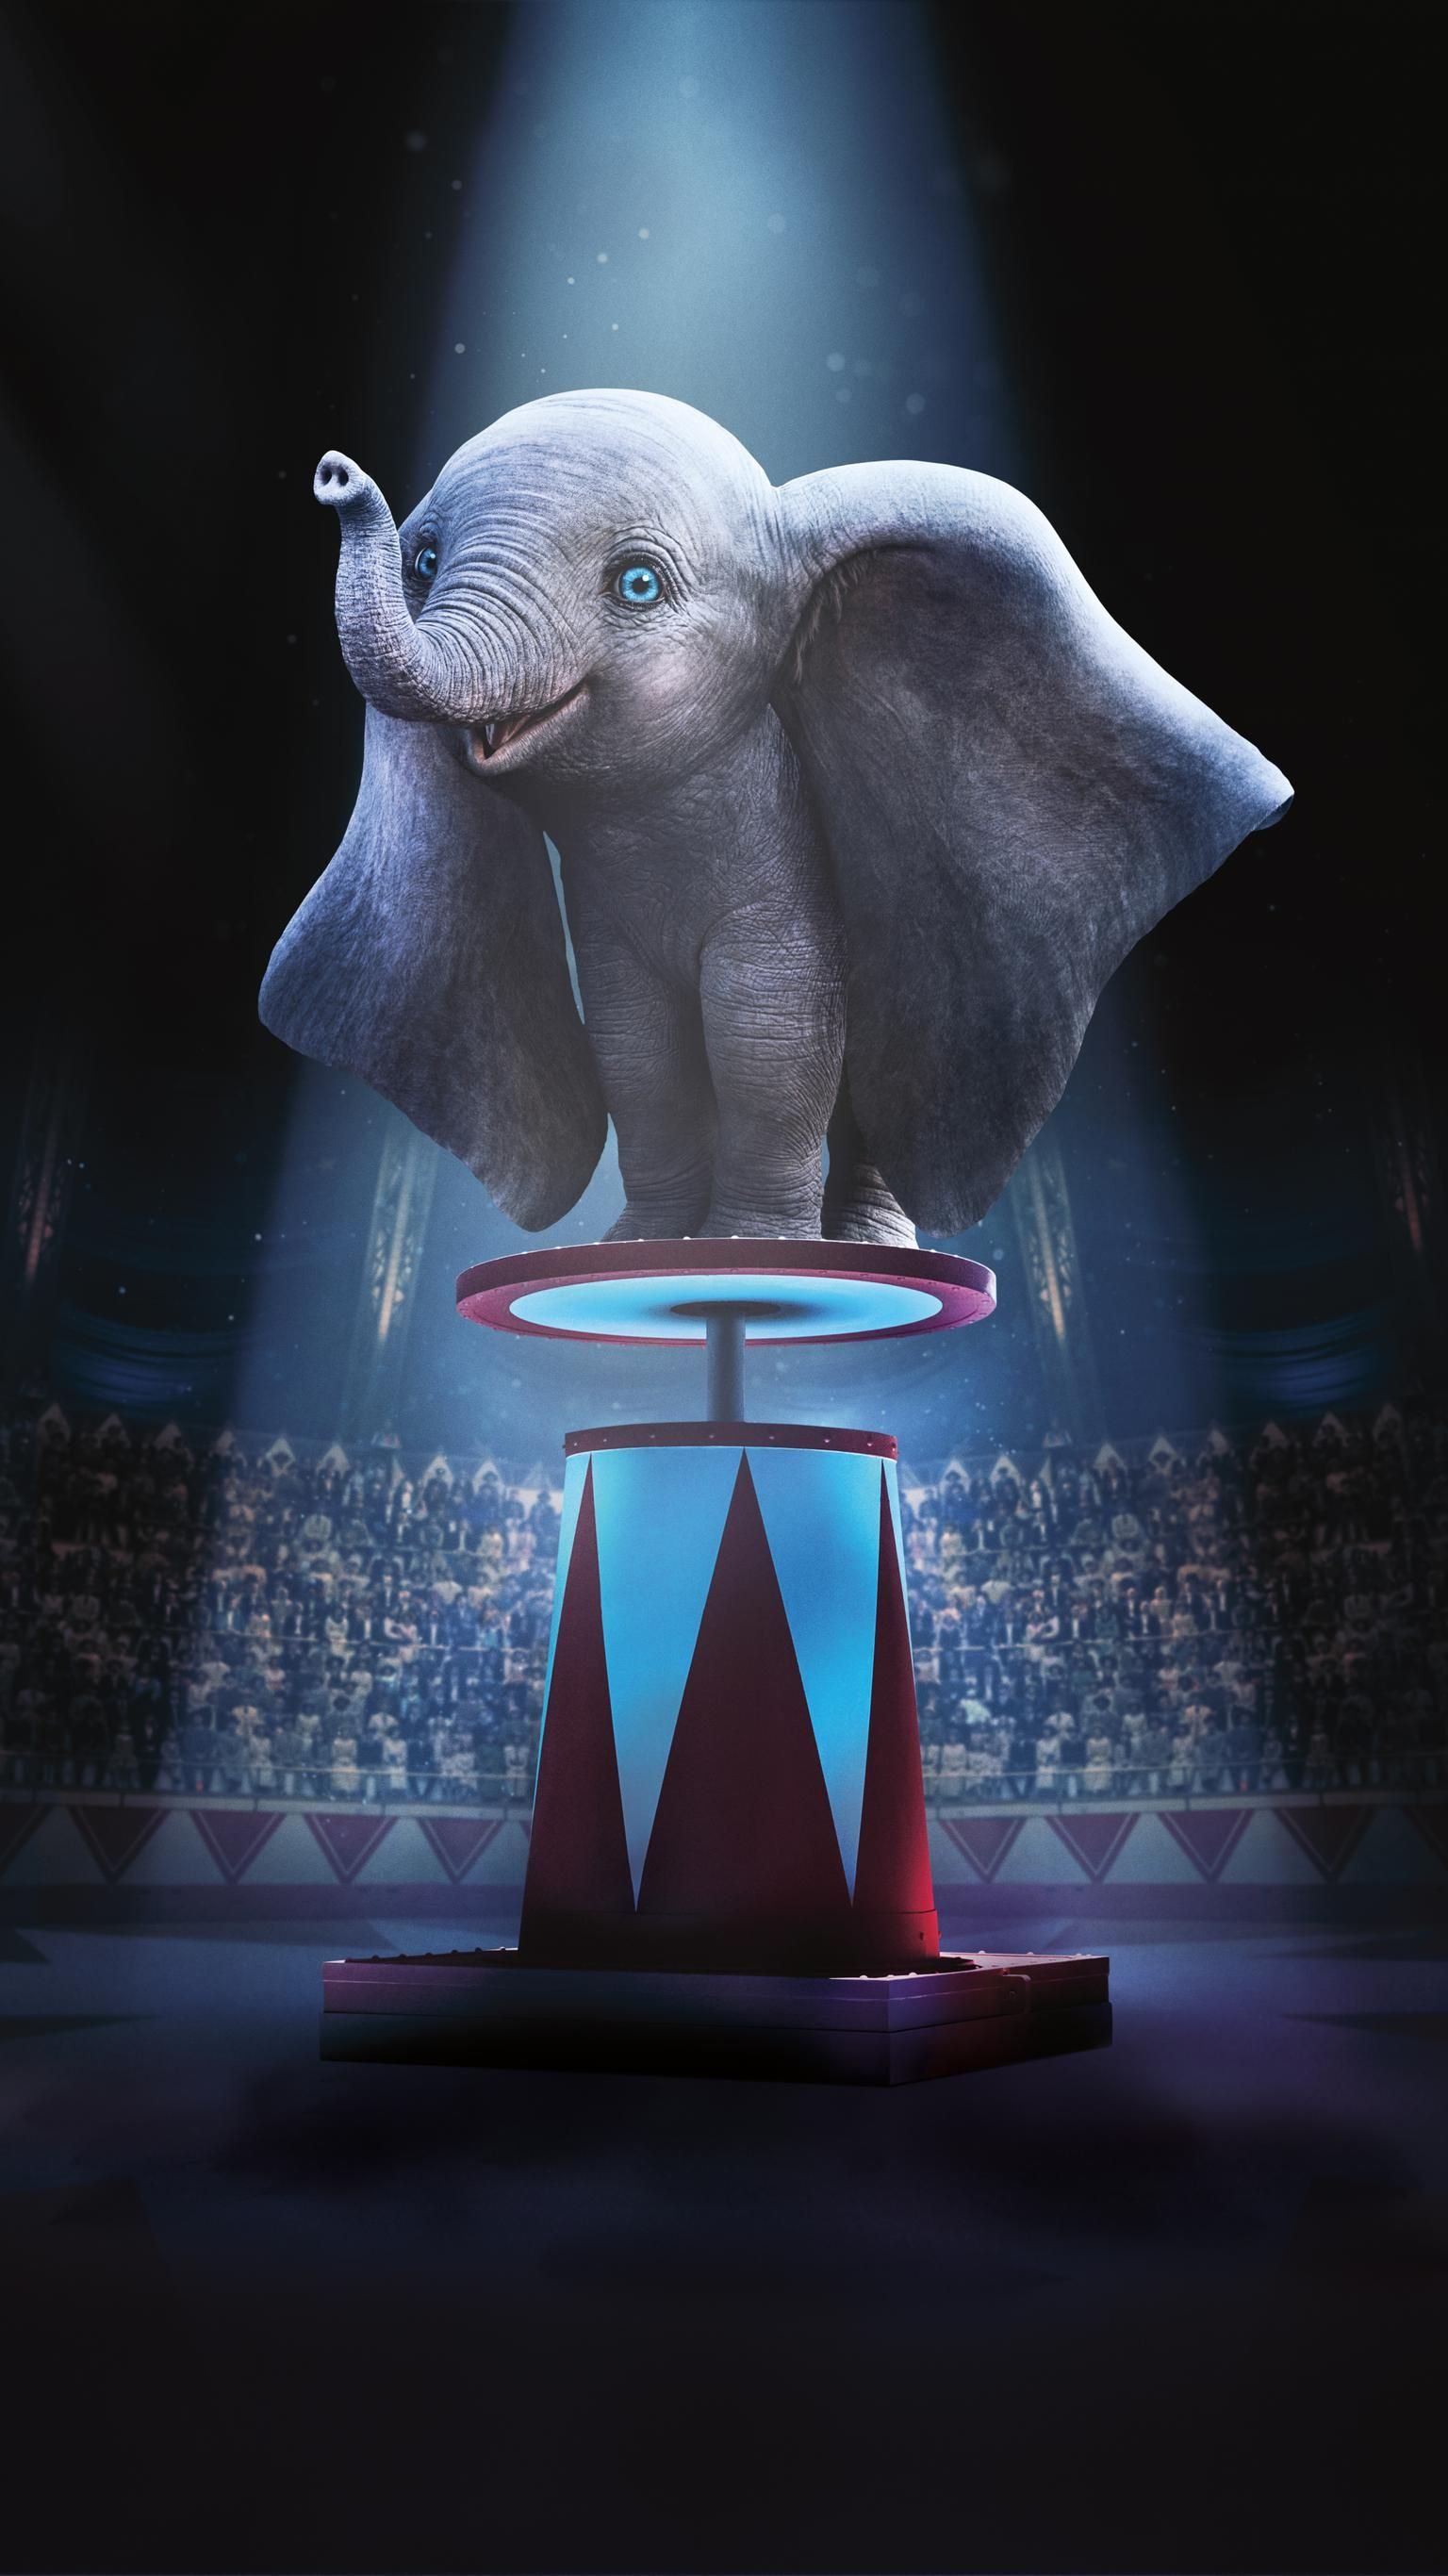 Dumbo (2019) Phone Wallpaper Dumbo movie, Wallpaper